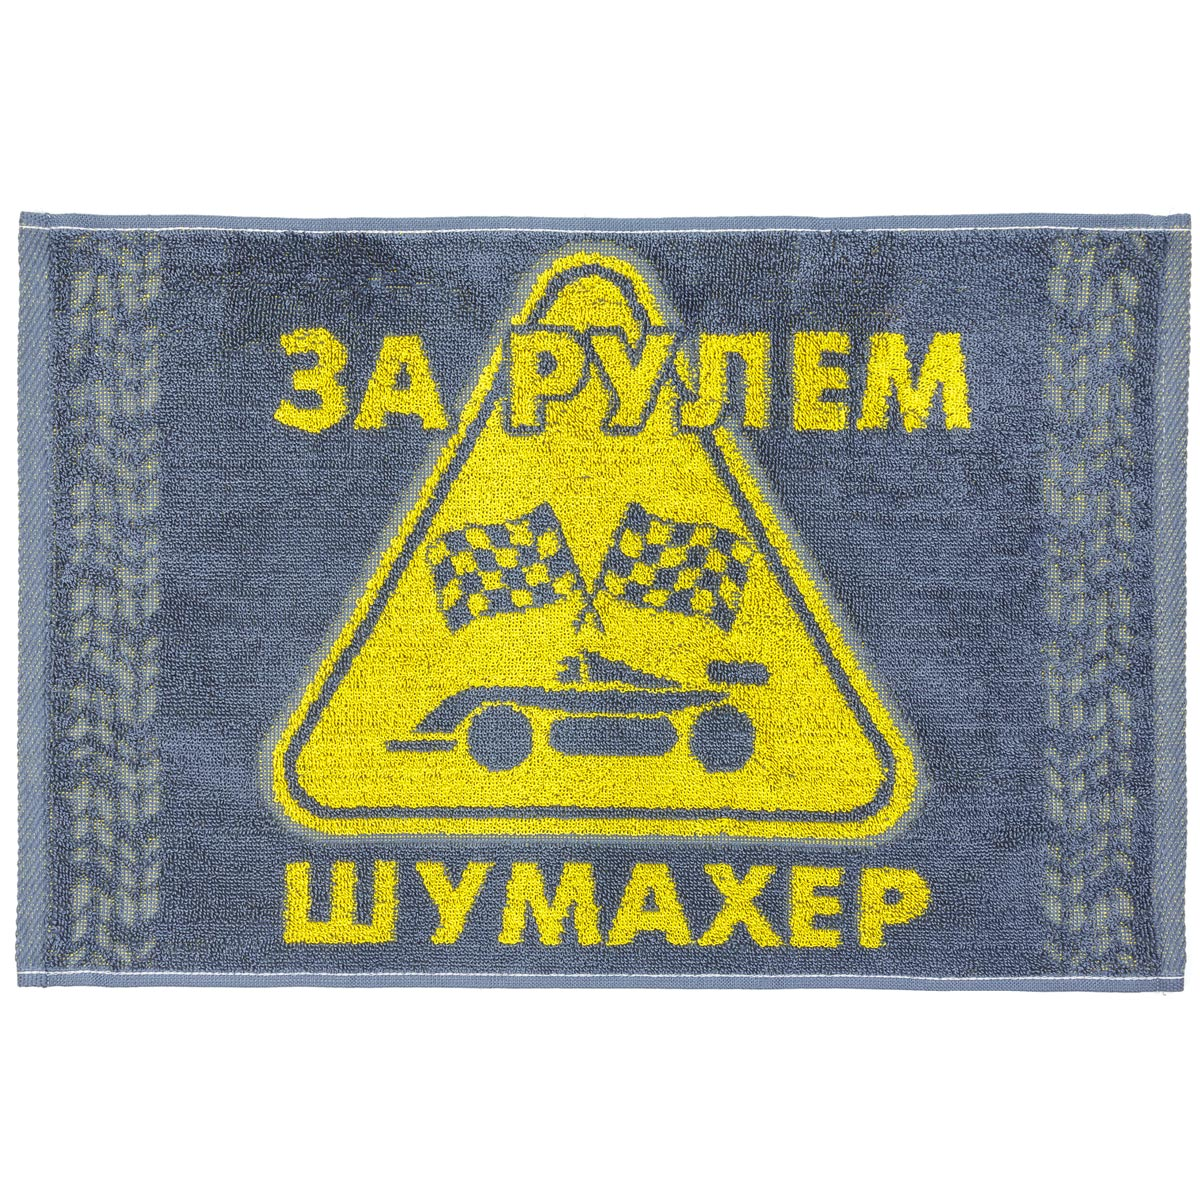 Полотенце За рулем Шумахер р. 30х50Махровые полотенца<br>Плотность:380-400 г/кв. м<br><br>Тип: Полотенце<br>Размер: 30х50<br>Материал: Махра